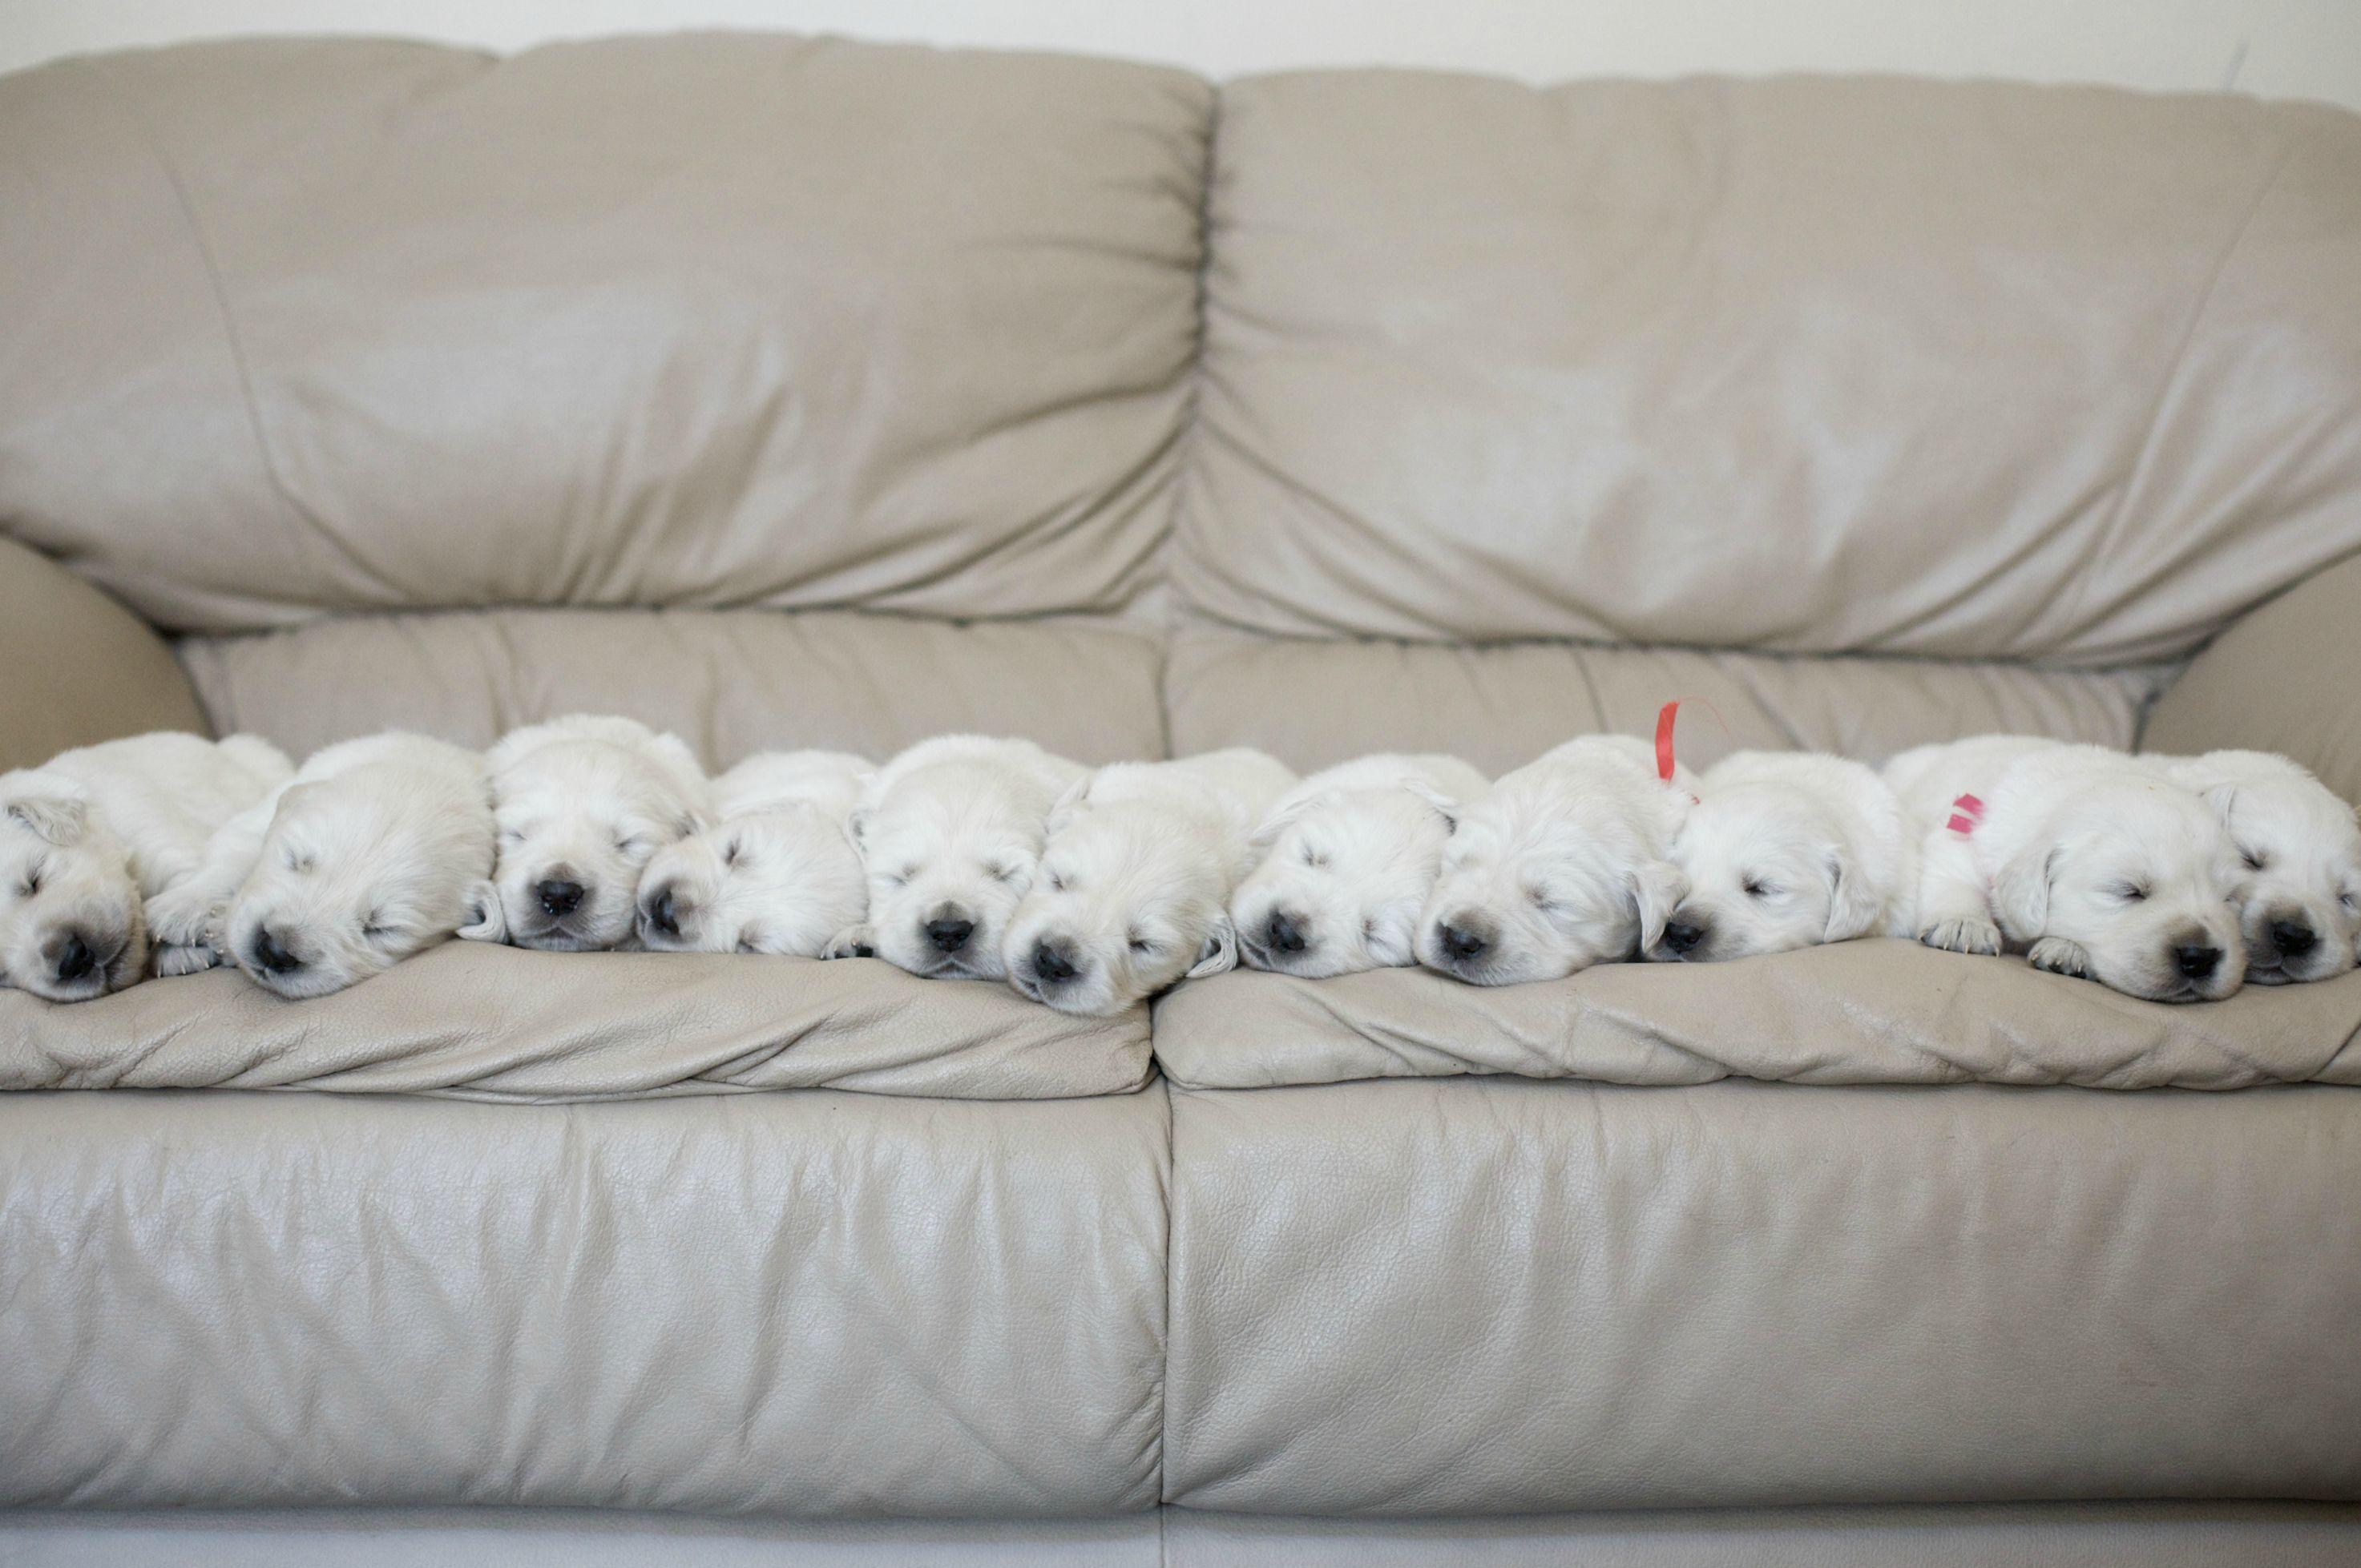 sleeping dogs how to kill yaogai